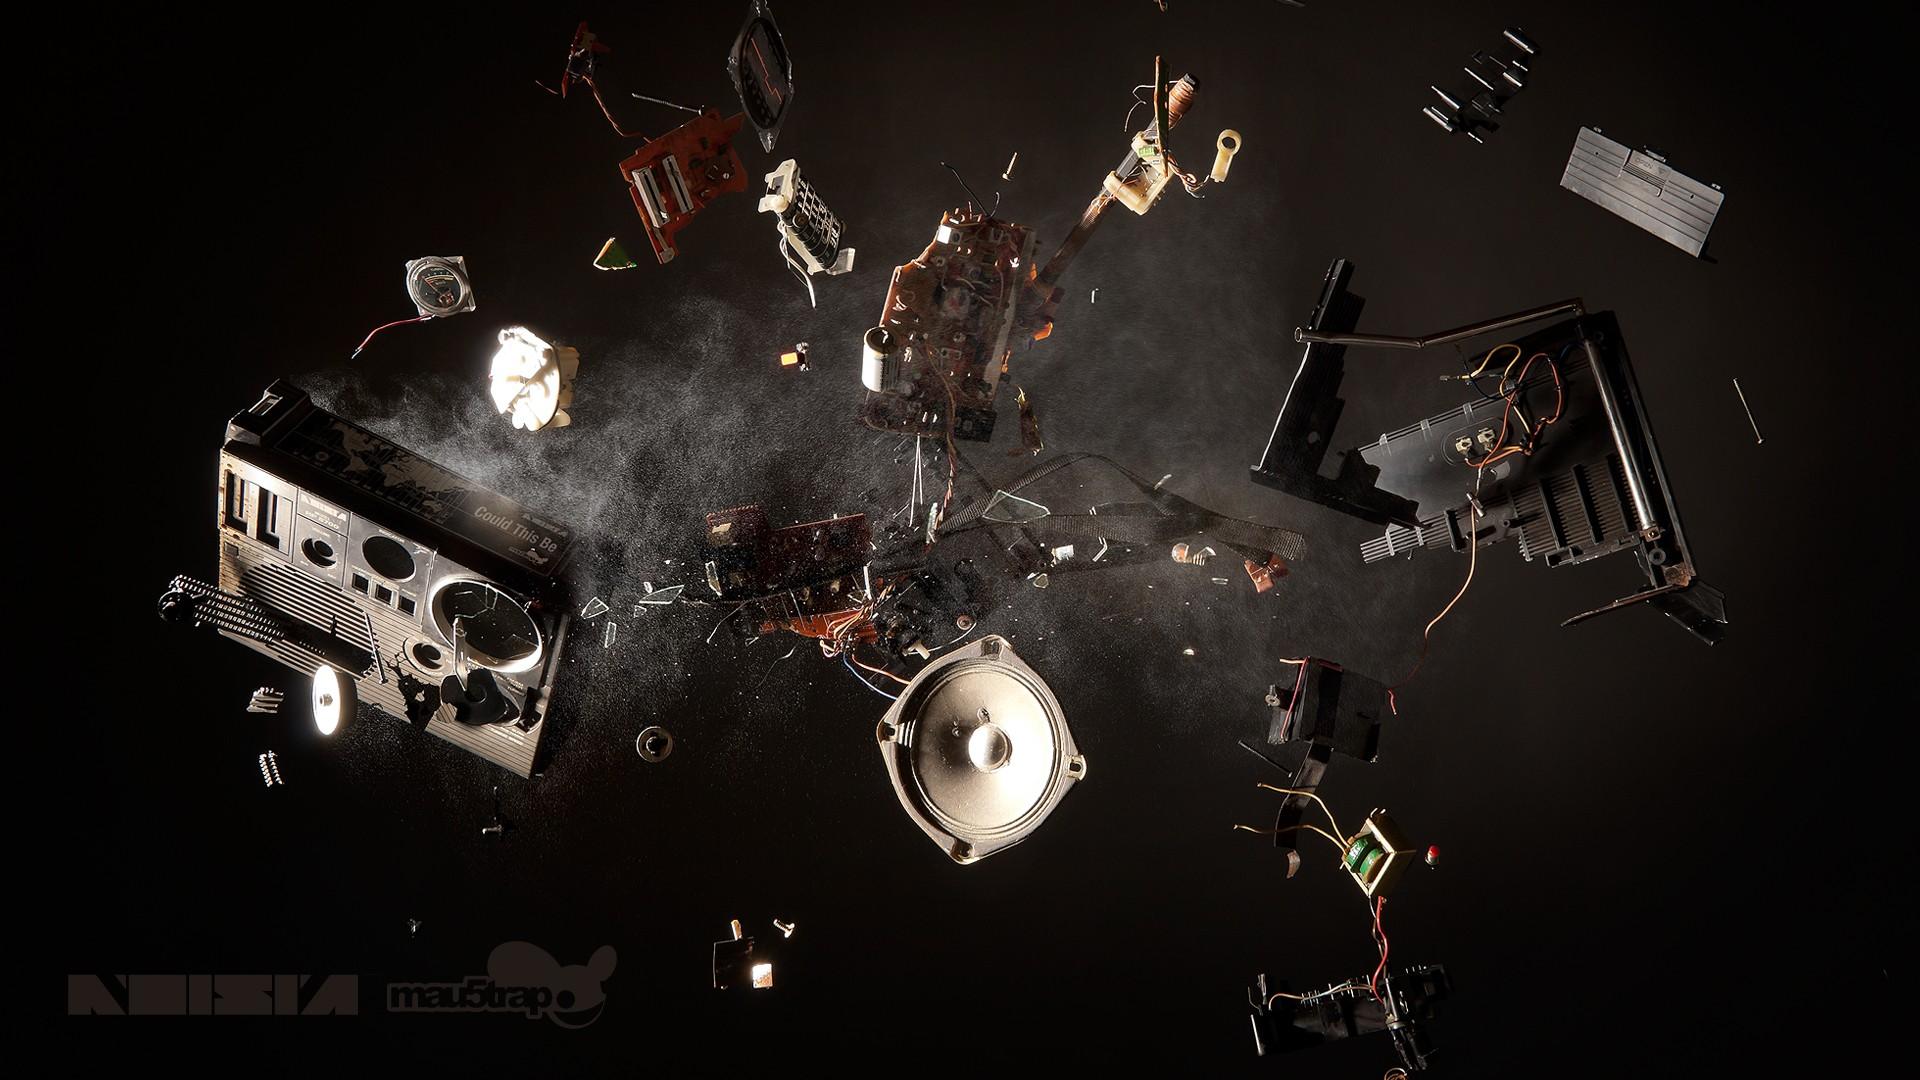 Amazing Wallpaper Music Desktop - HD-Wallpapers-Music-015  You Should Have_854584.jpg